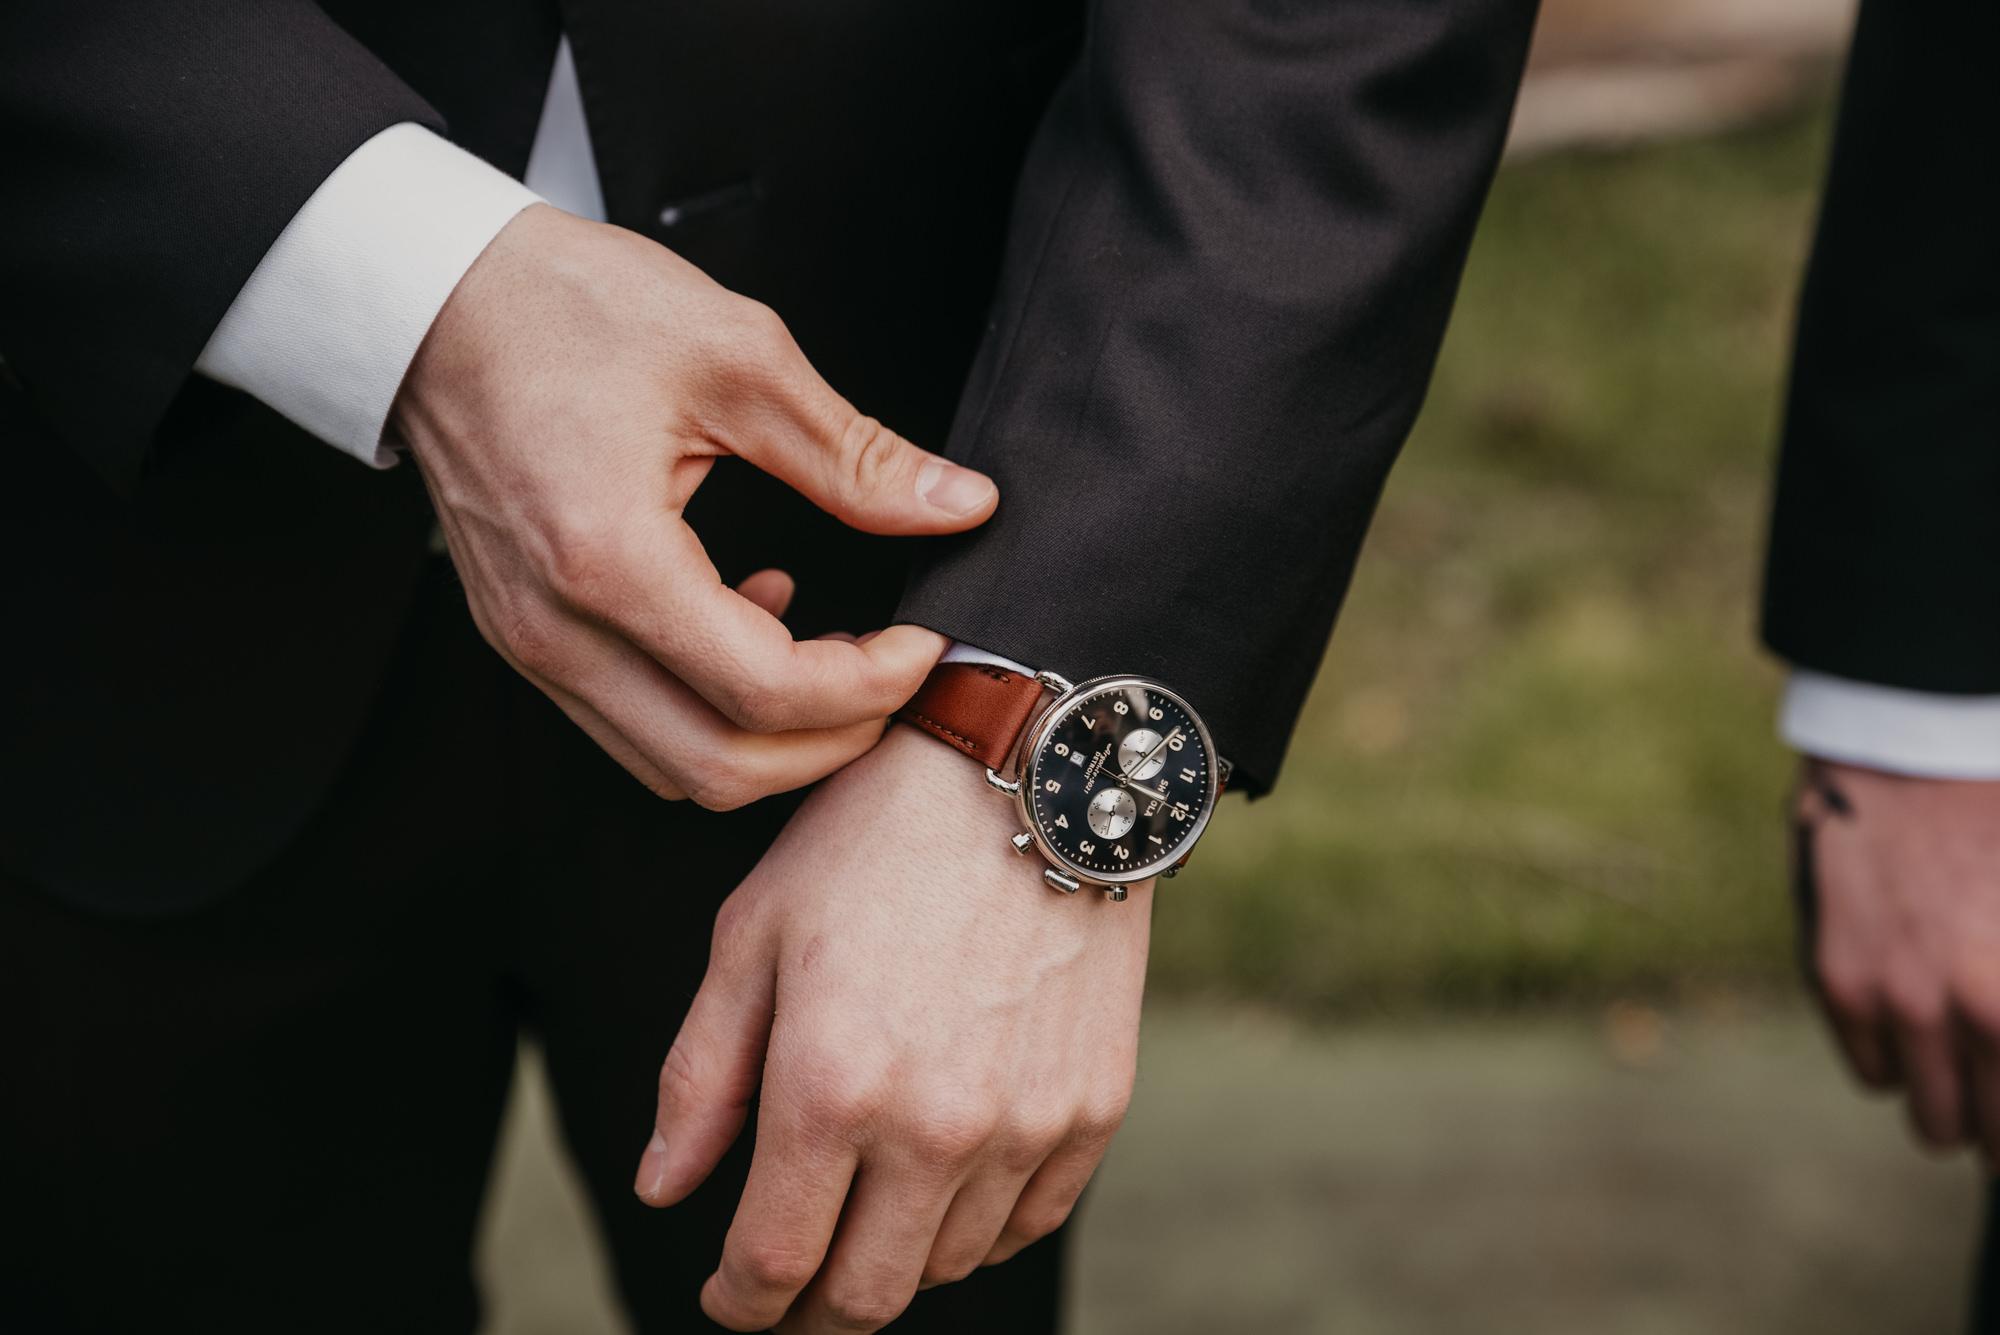 getting-ready-photos-seattle-weddings-groom-shinola-watch-4016-3.jpg